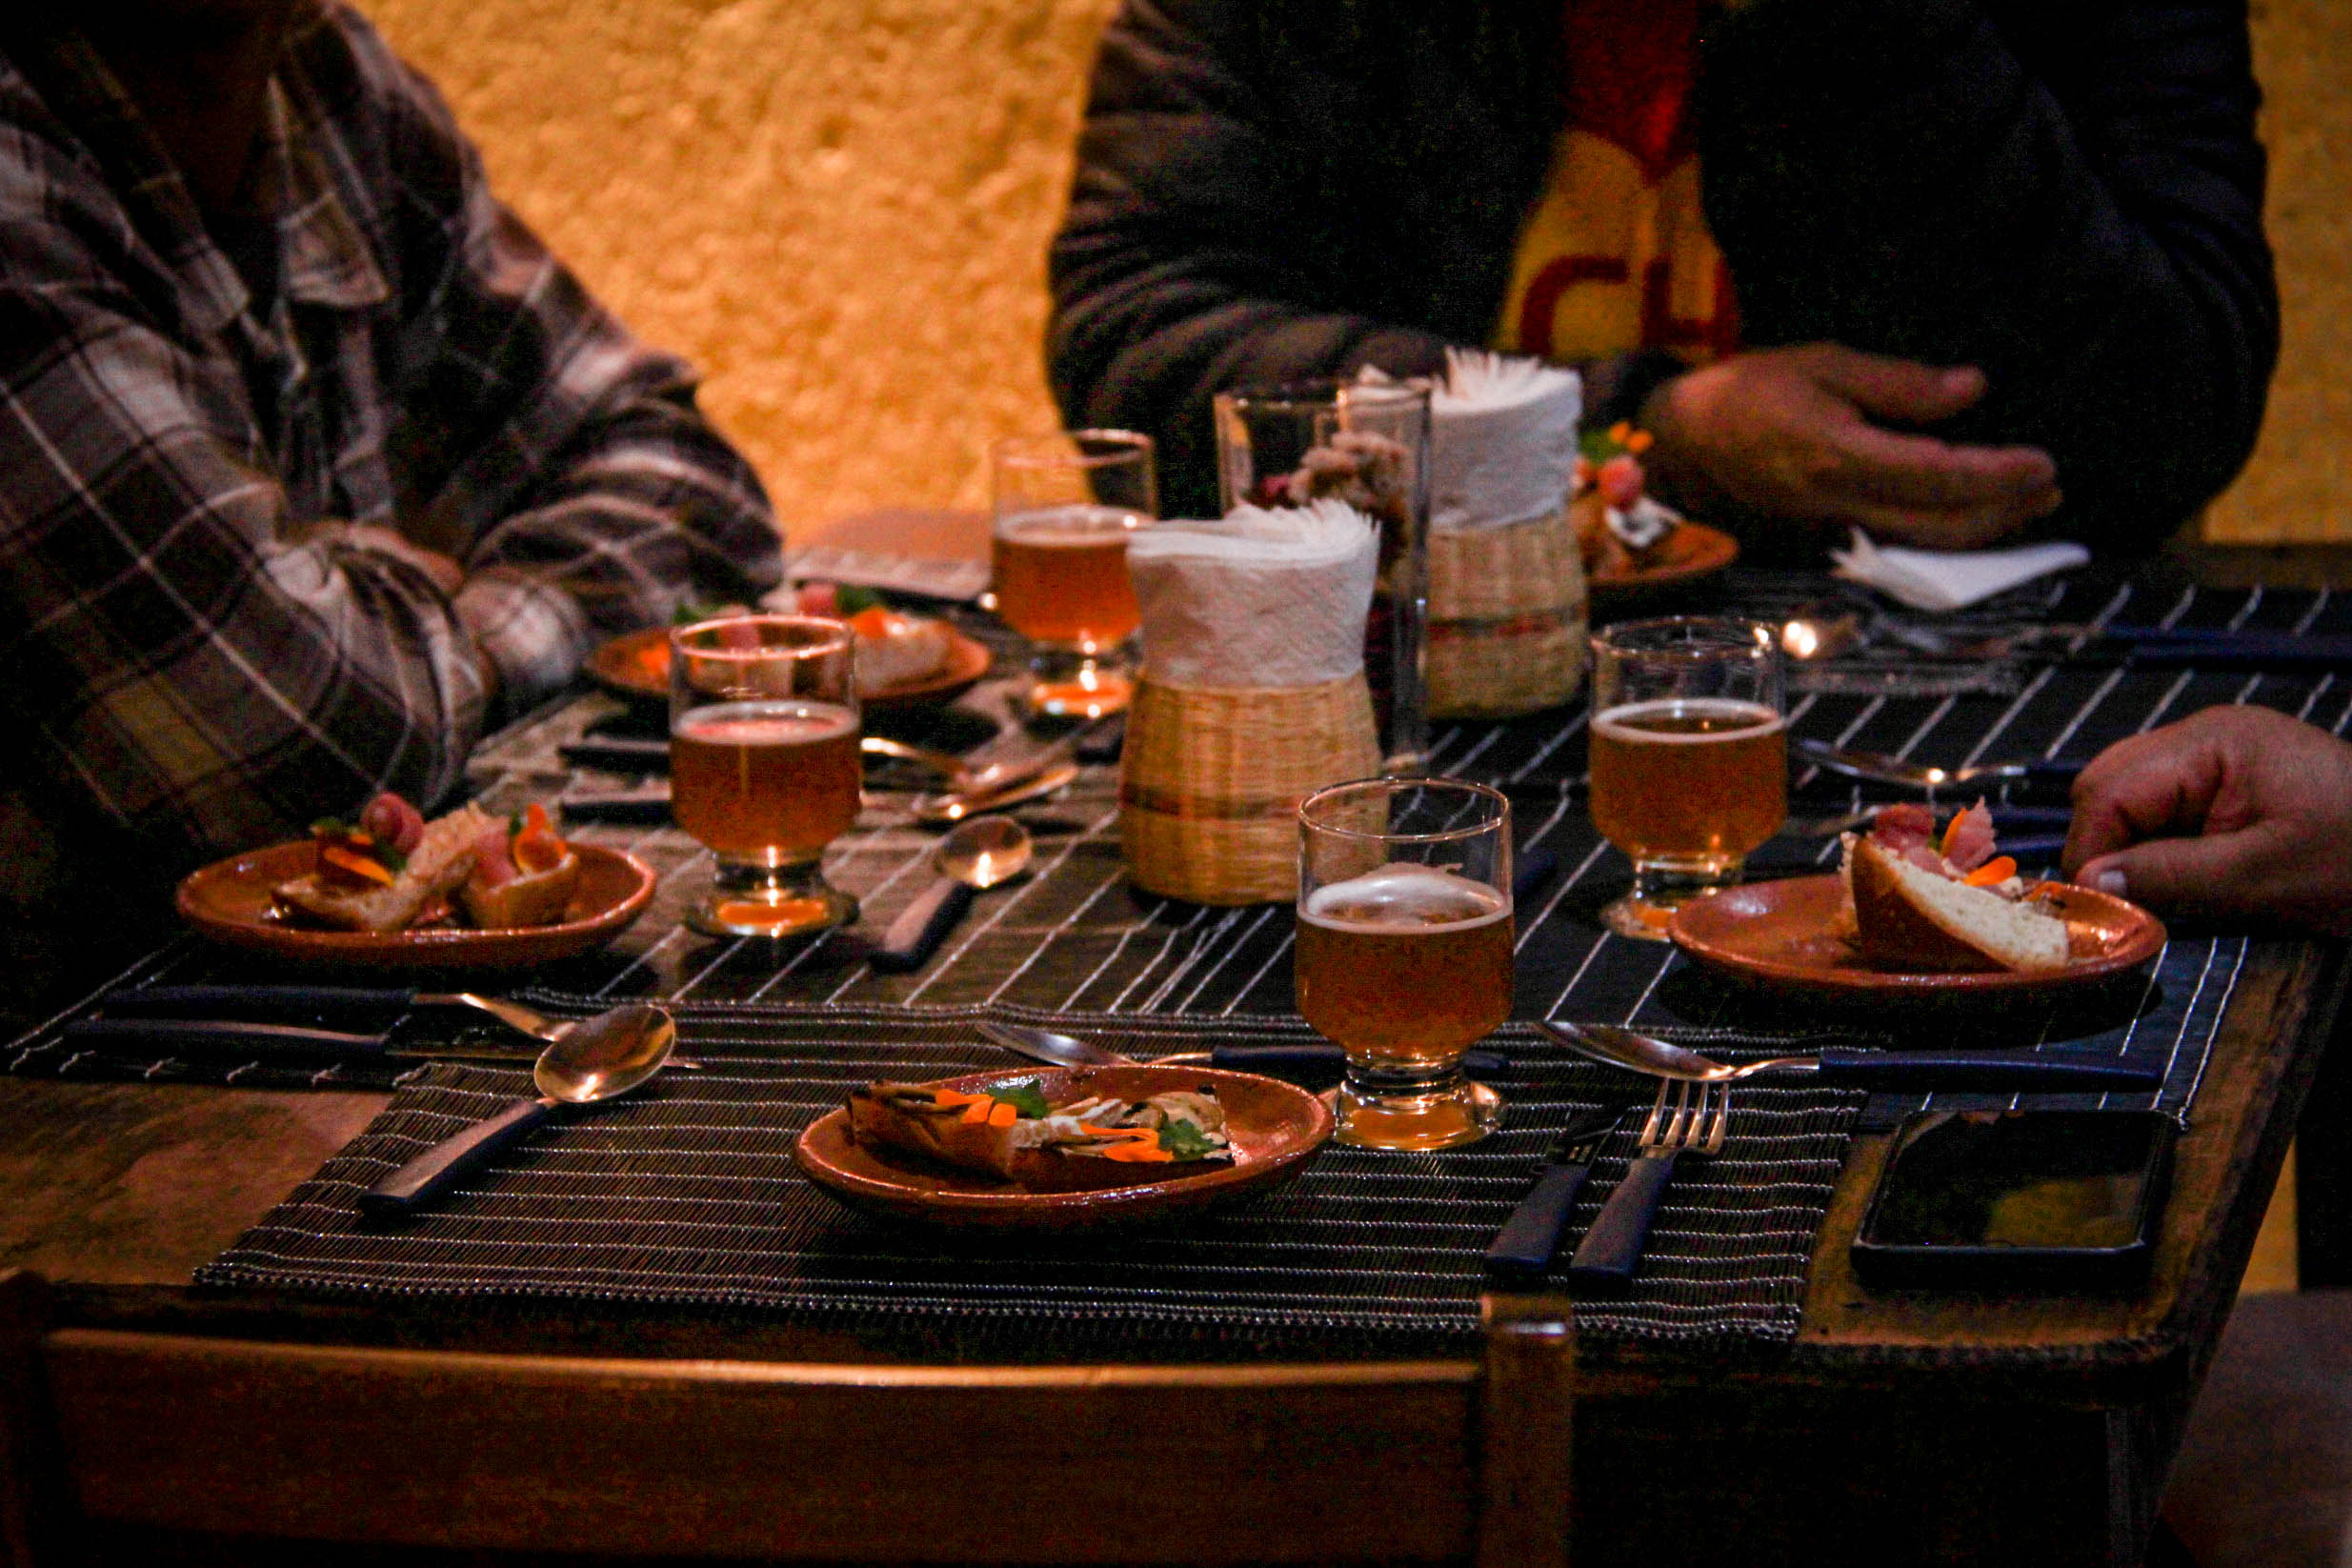 SABORES DE SAN CRISTÓBAL: Cocina abierta